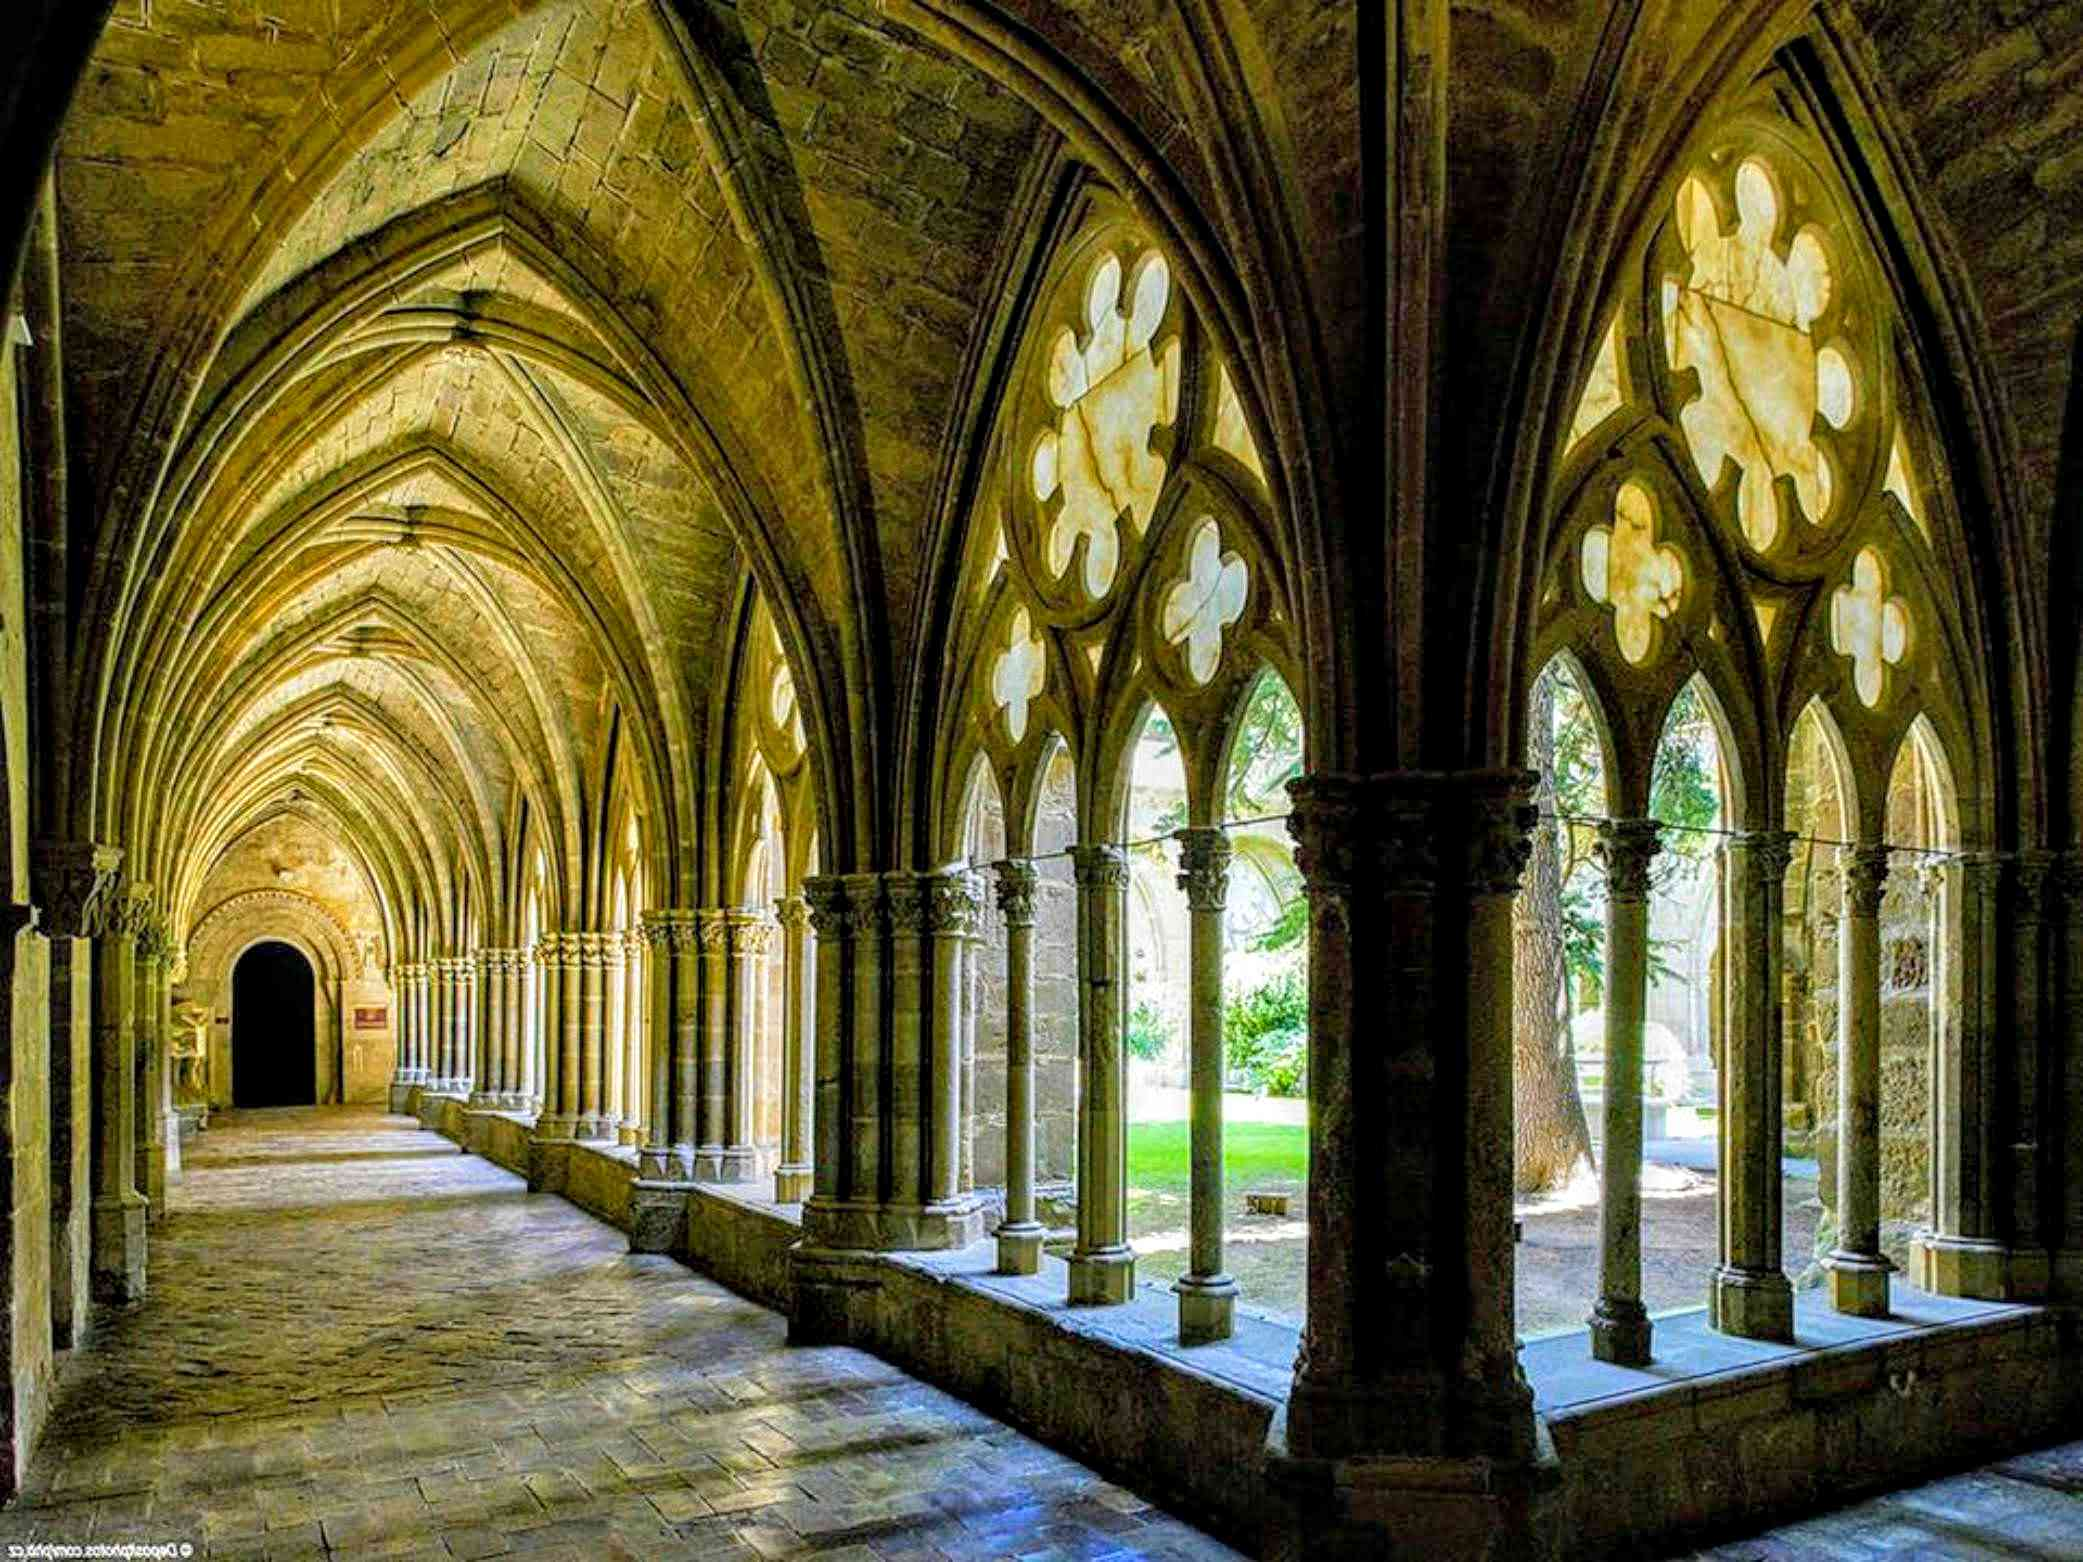 cloister of the Veruela monastery, Vera del Moncayo, Zaragoza (Spain)